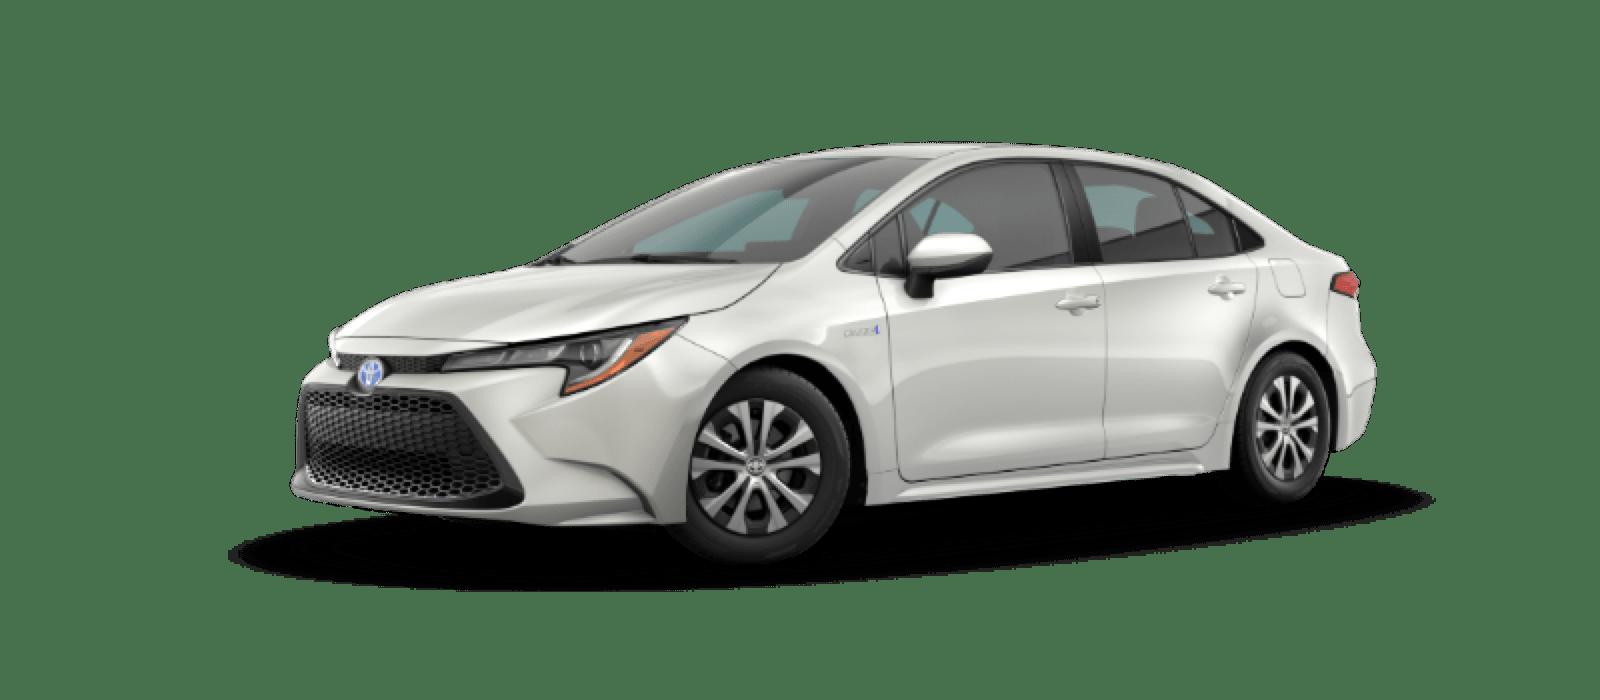 Car Dealerships Louisville Ky >> Louisville KY | New & Used Car Dealership | Oxmoor Toyota